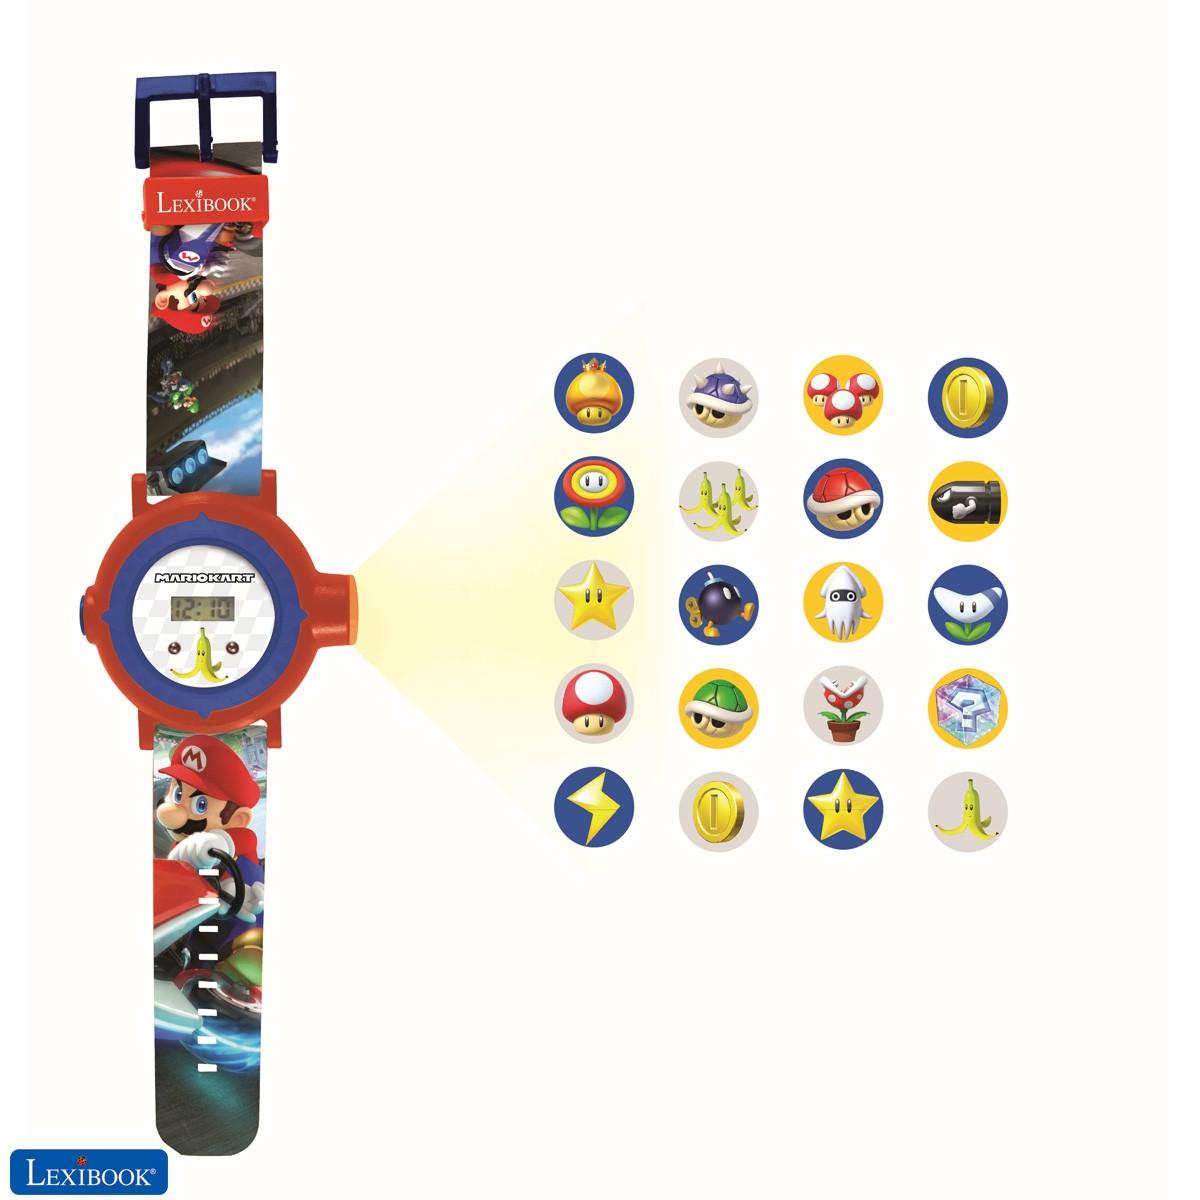 Nintendo Mario Kart Adjustable projection watch  digital screen – 20 images of Mario Kart – for Children / Boys